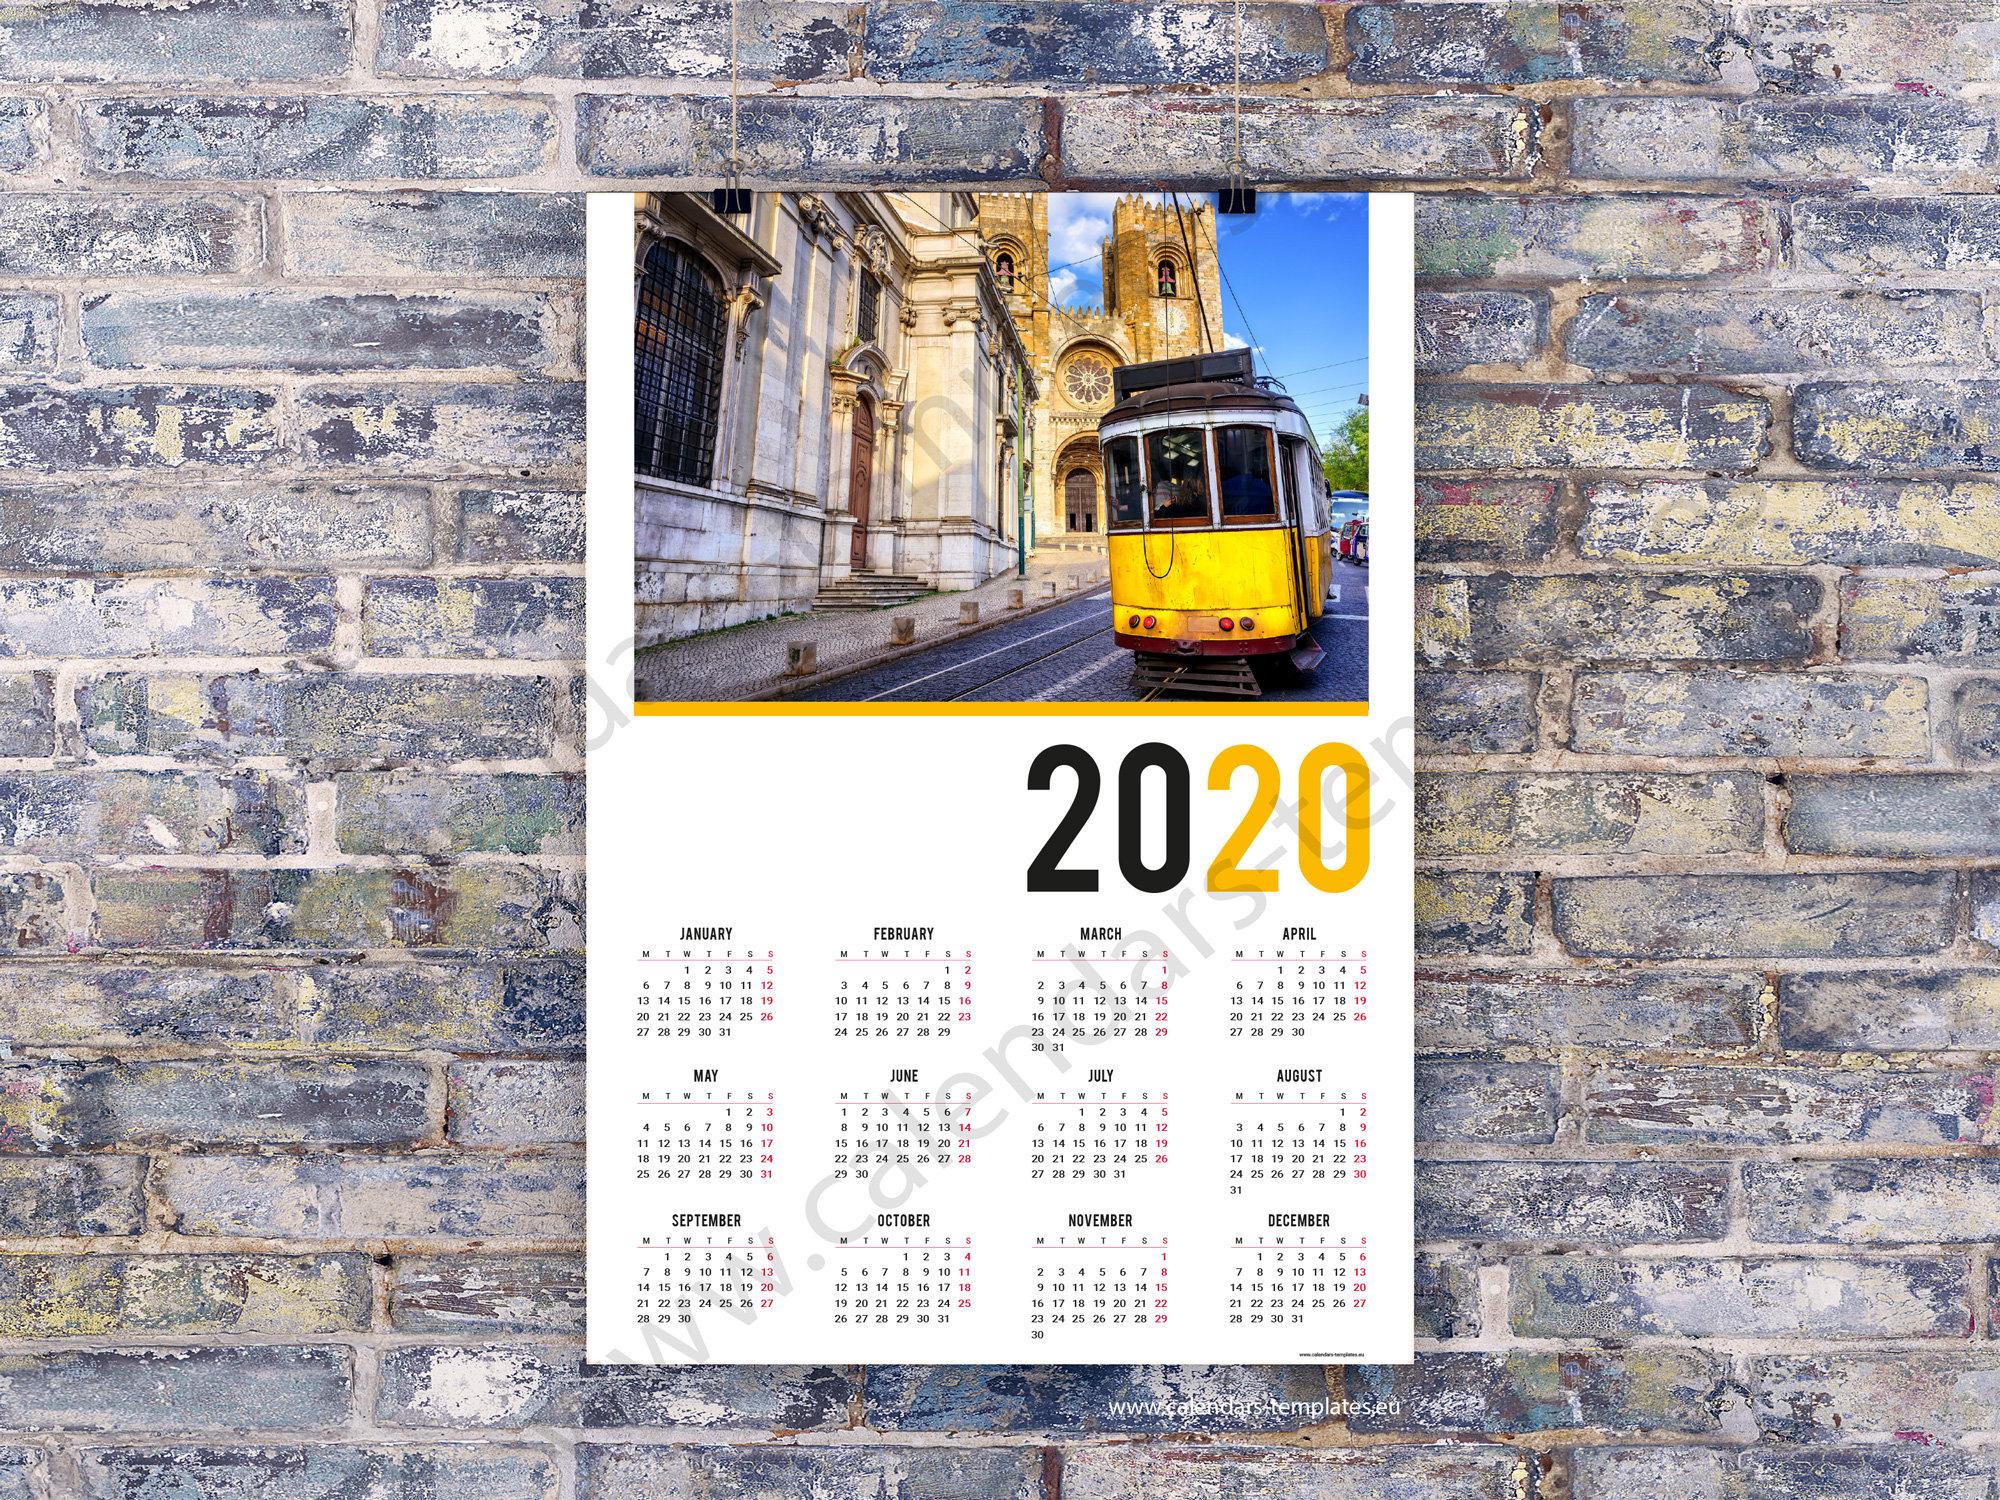 2020 Poster Wall Calendar Template (Kjp-W6). Pdf Format